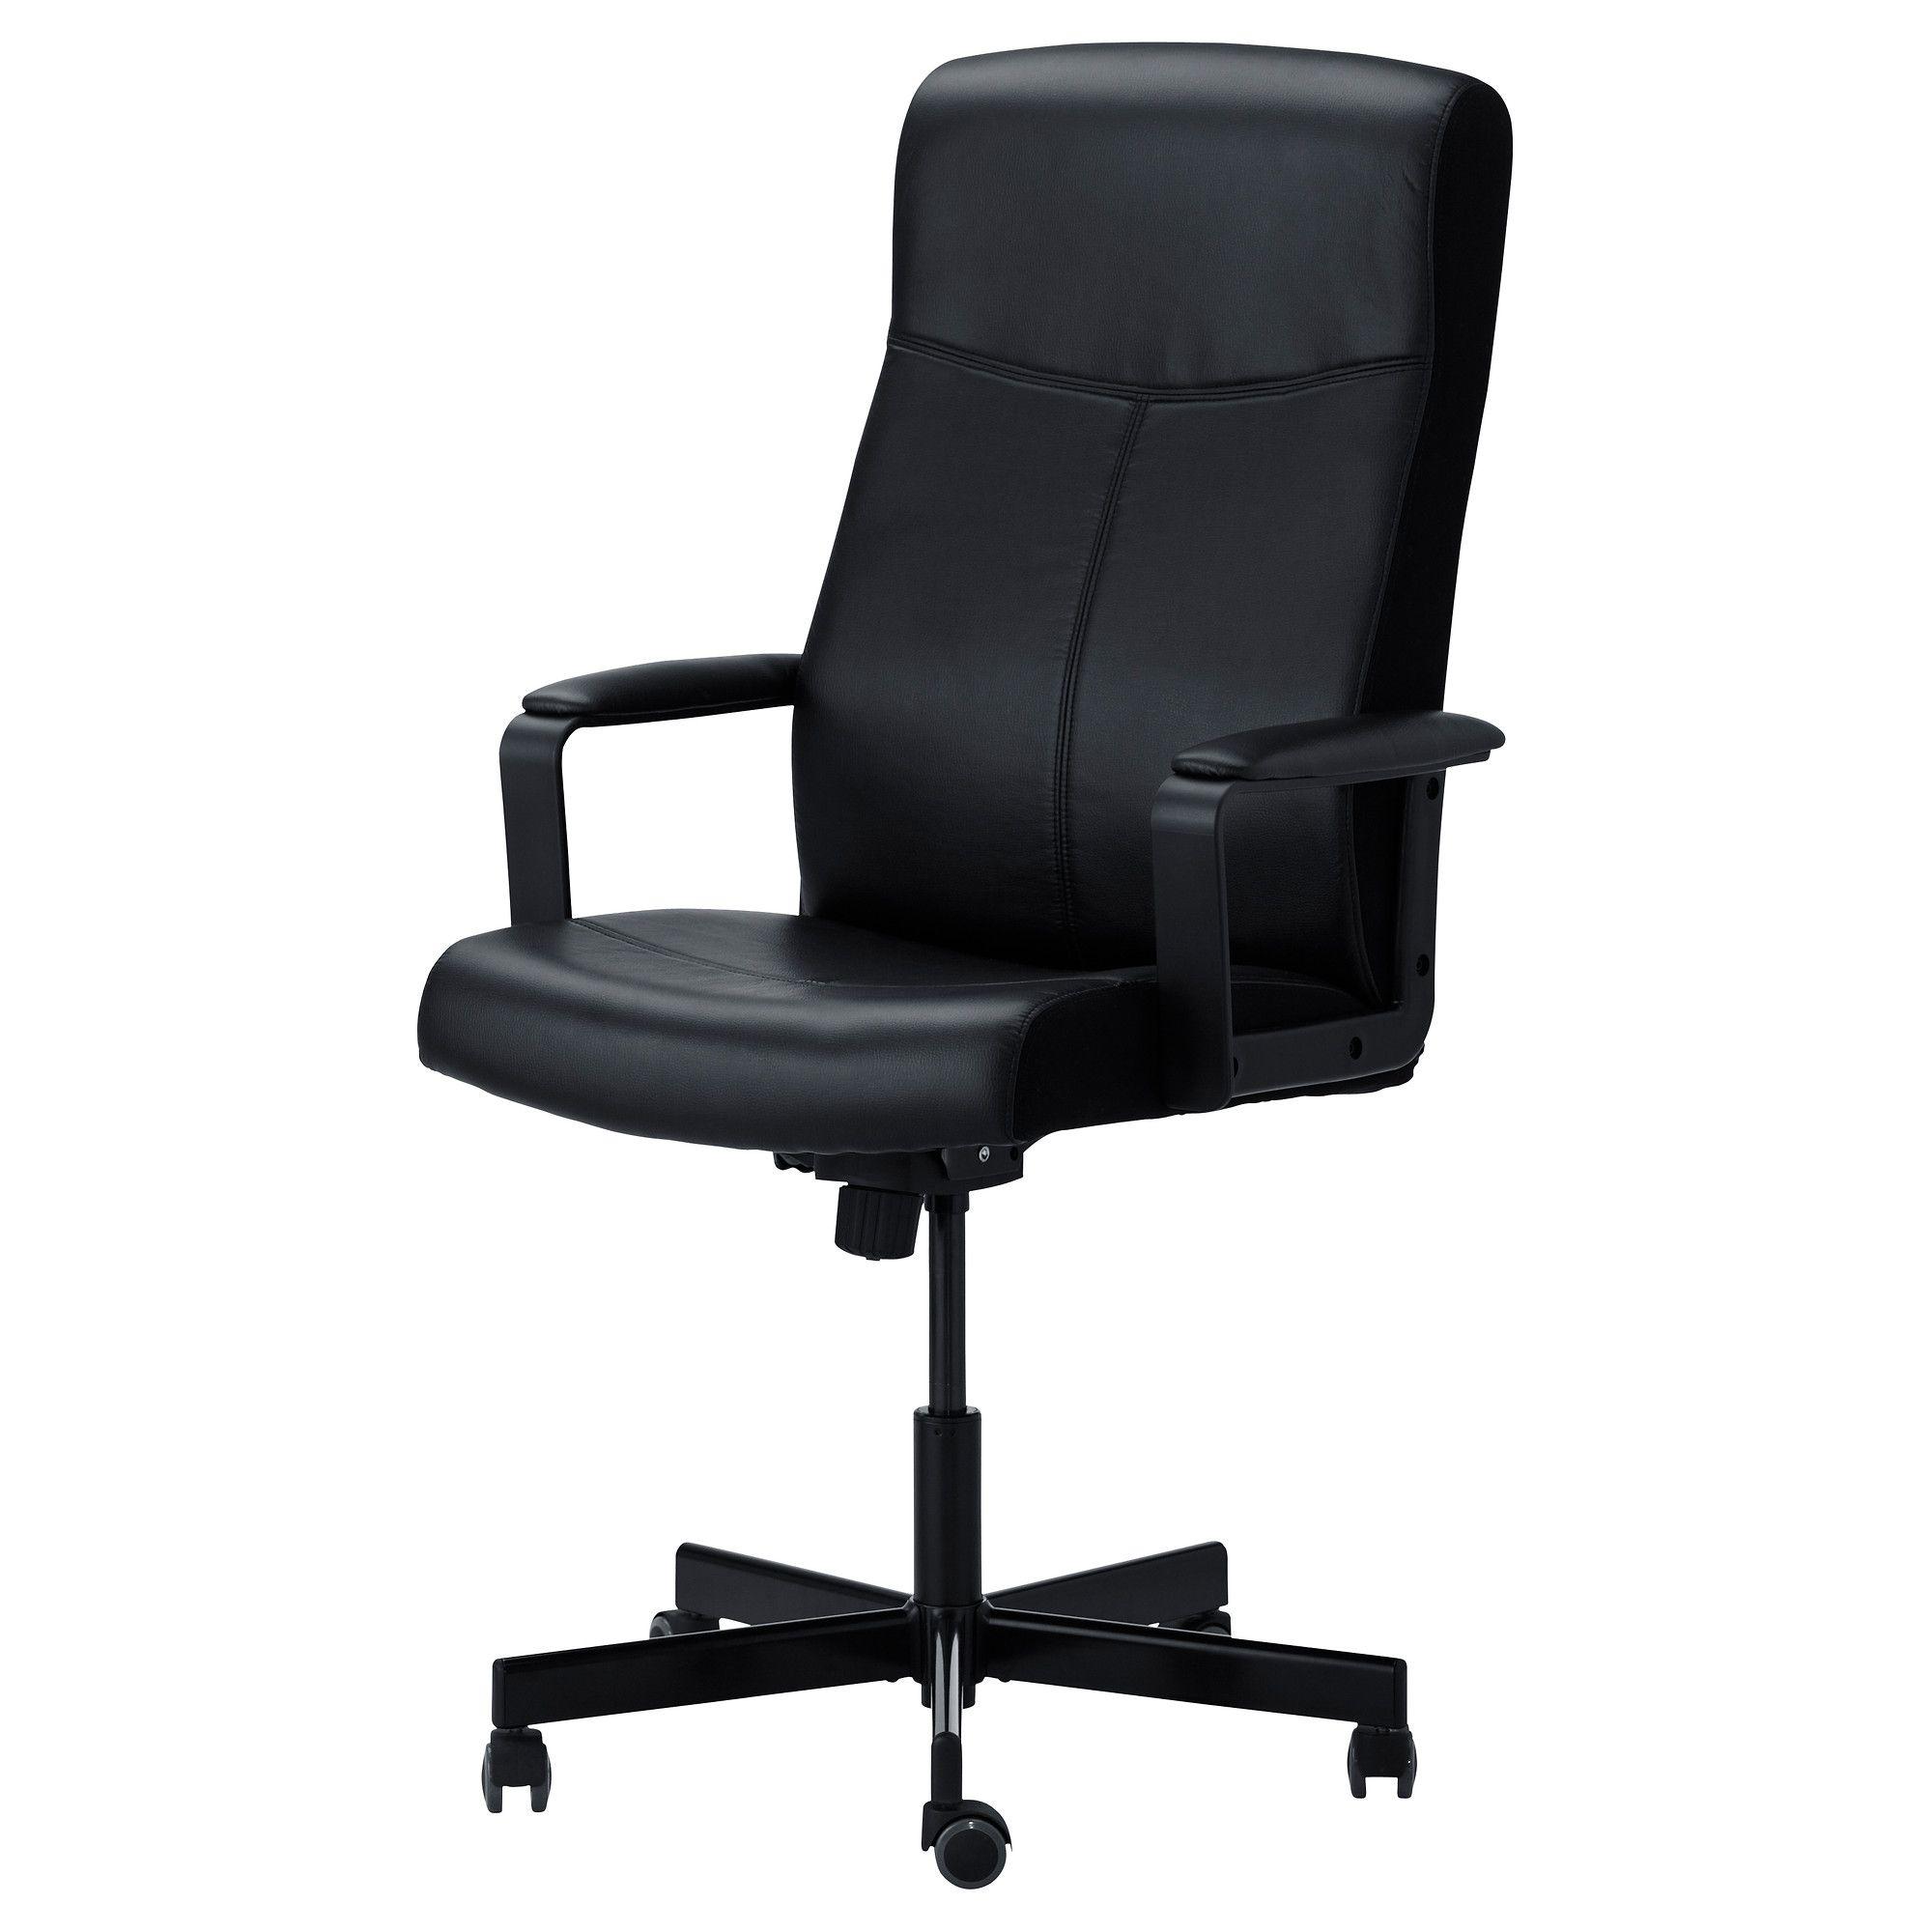 Ikea Us Furniture And Home Furnishings Ikea Office Chair Chair Buy Chair